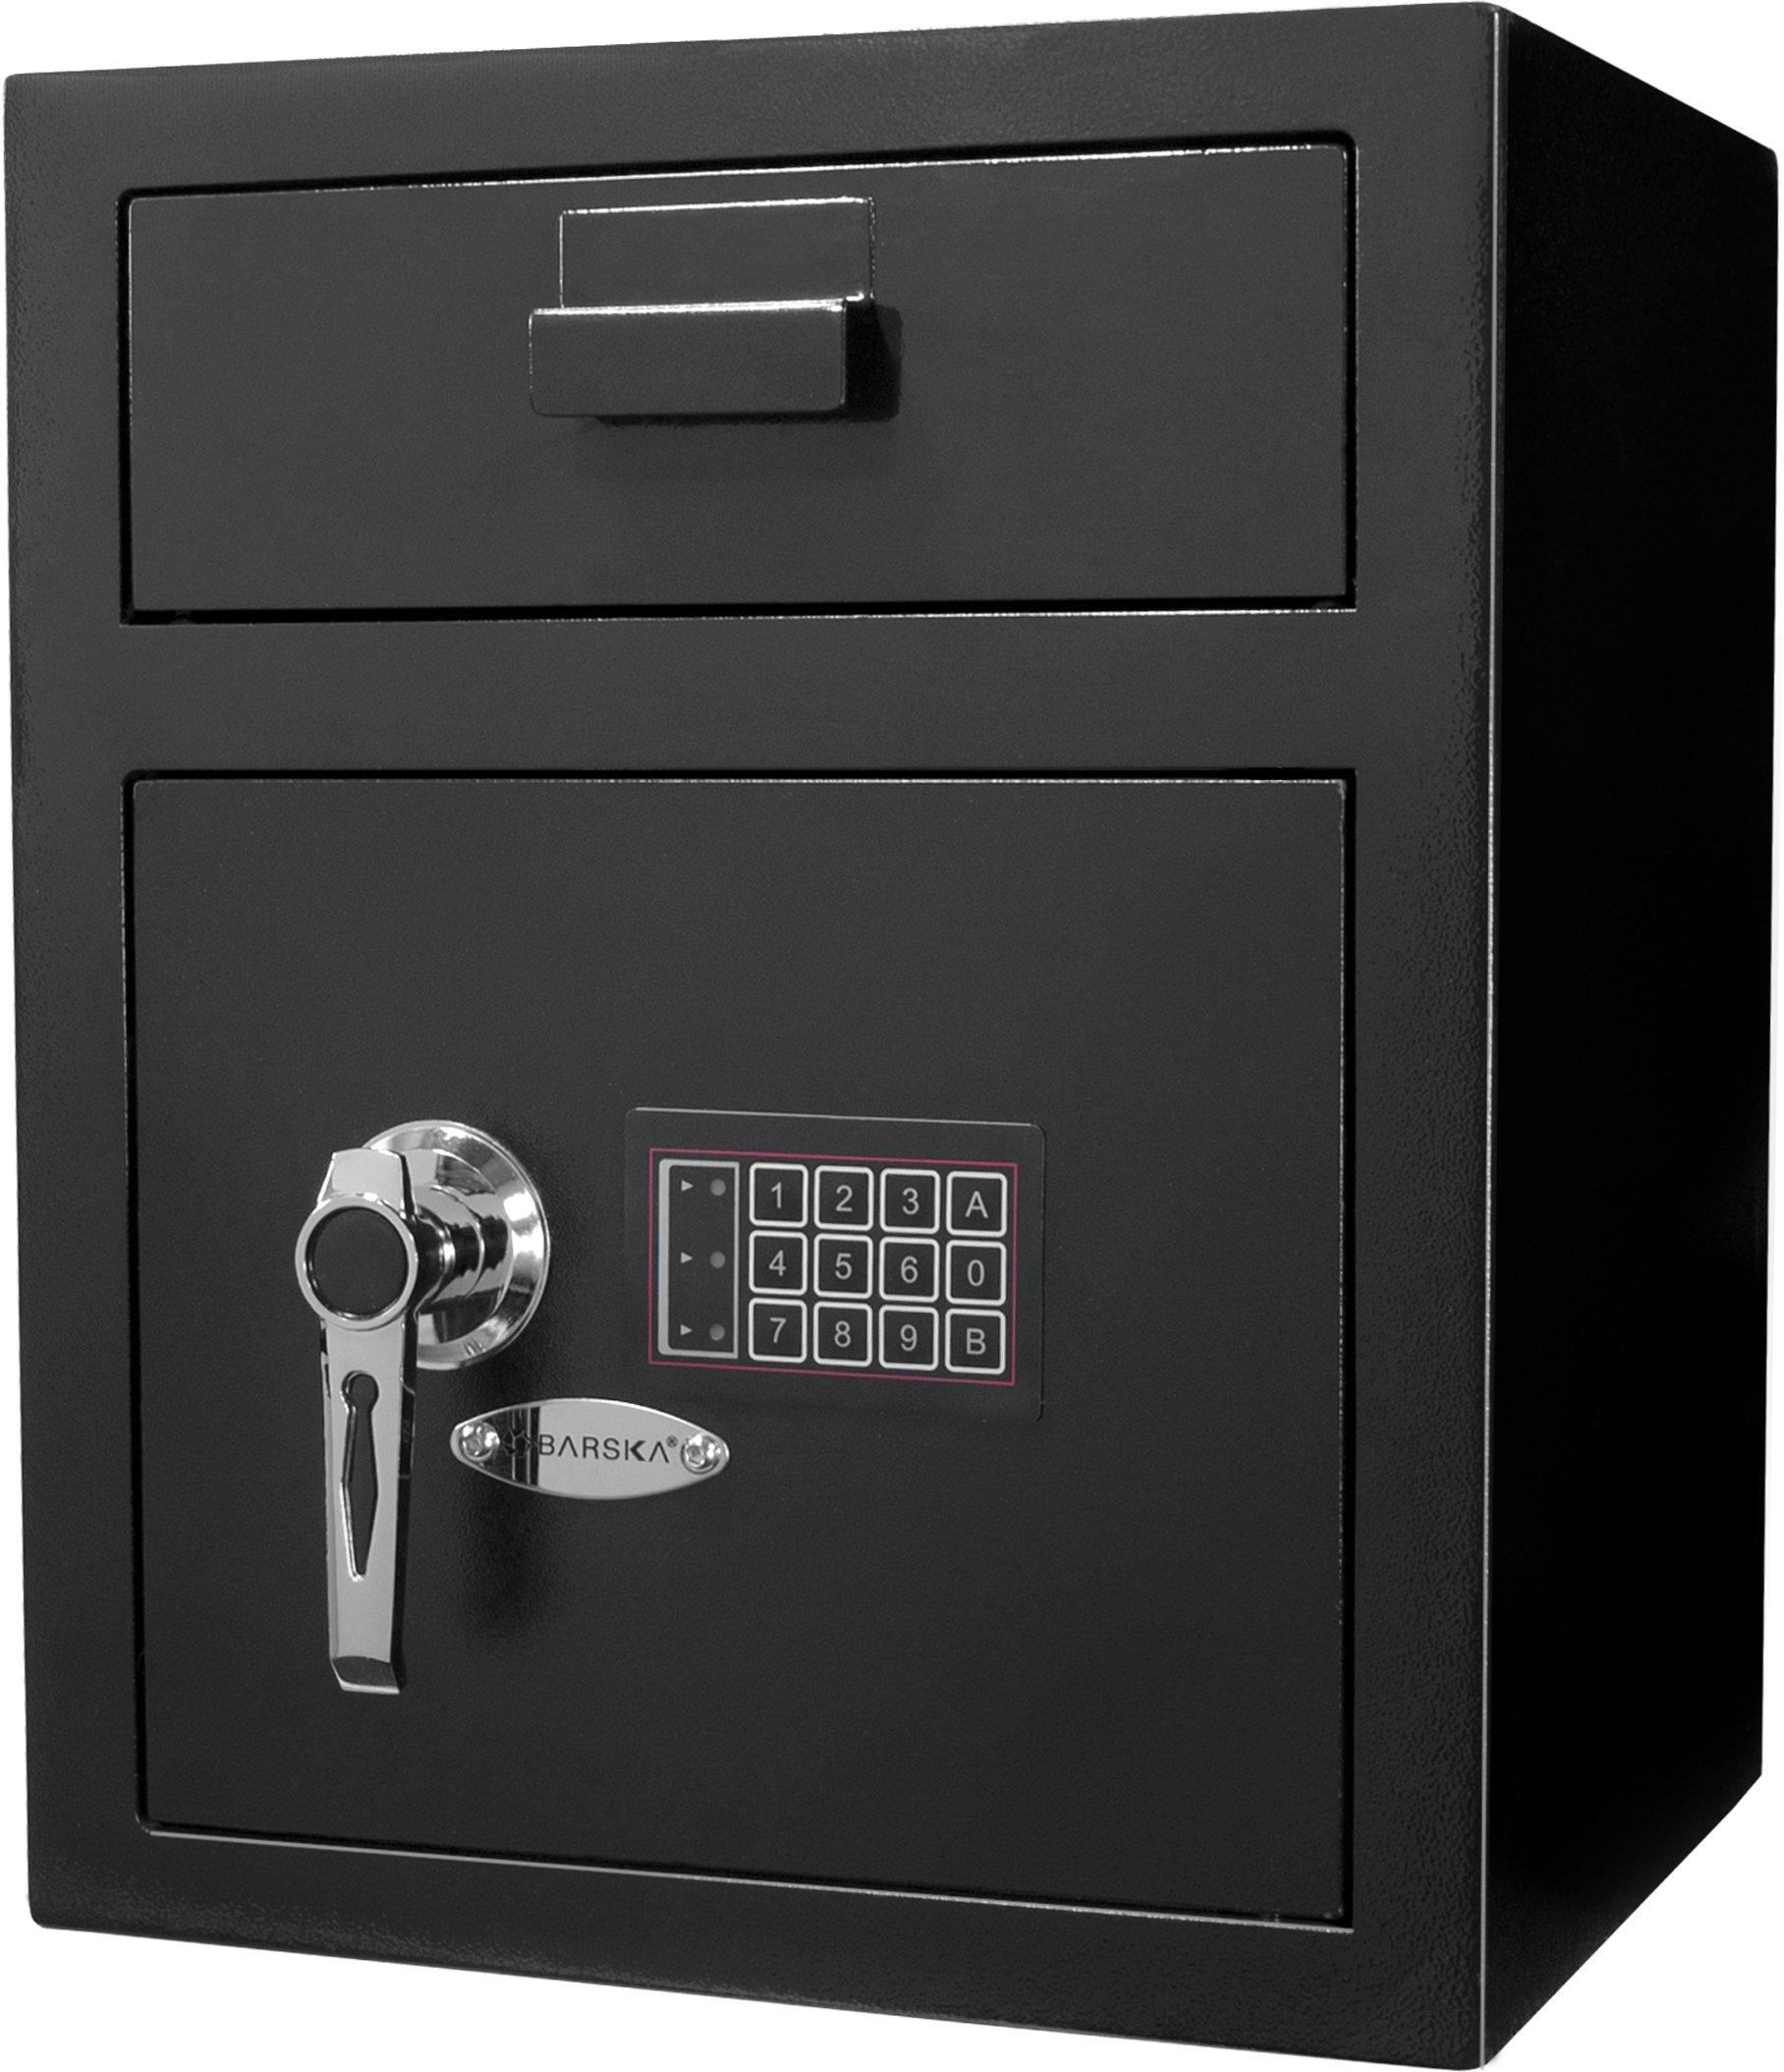 Winbest Metal Digital Keypad Security Lock Depository Drop Slot Parcel Mail Safe (15.33 in x 13.5 in x 19 in) by winbest